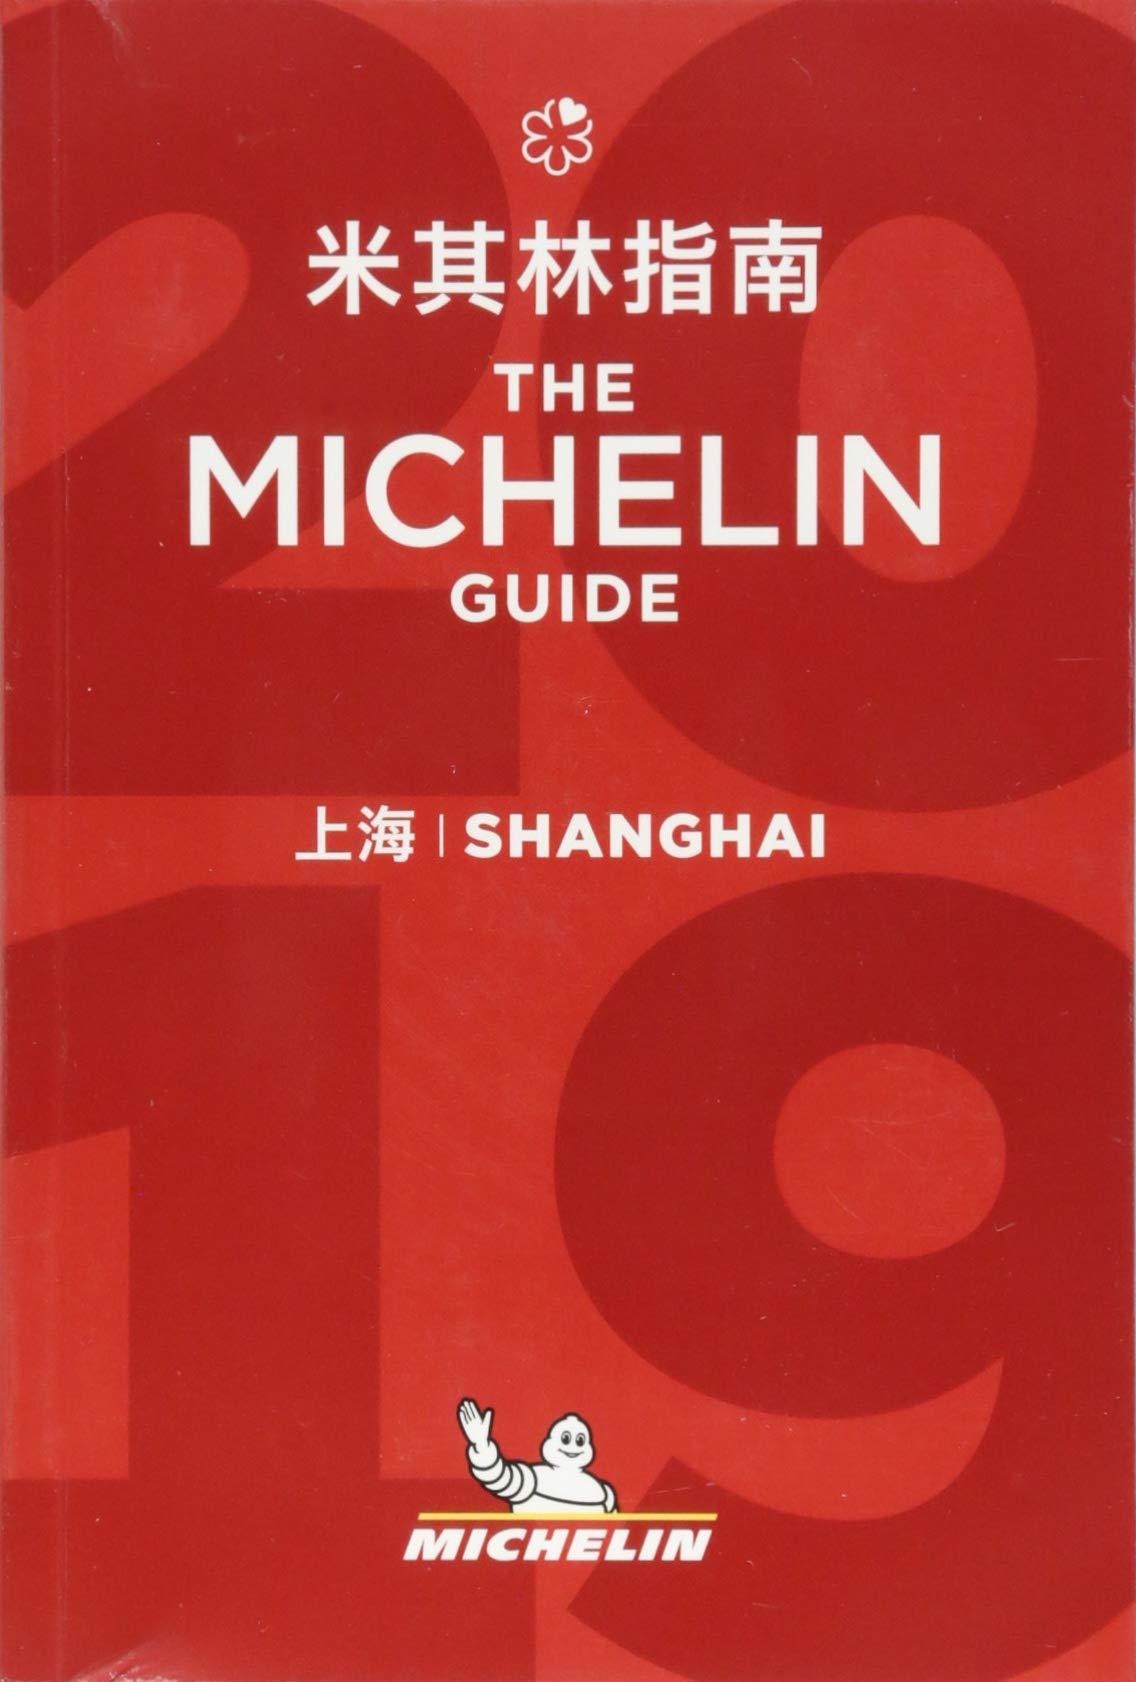 Shanghai - The MICHELIN guide 2019: The Guide MICHELIN Michelin Hotel & Restaurant Guides: Amazon.es: Michelin: Libros en idiomas extranjeros